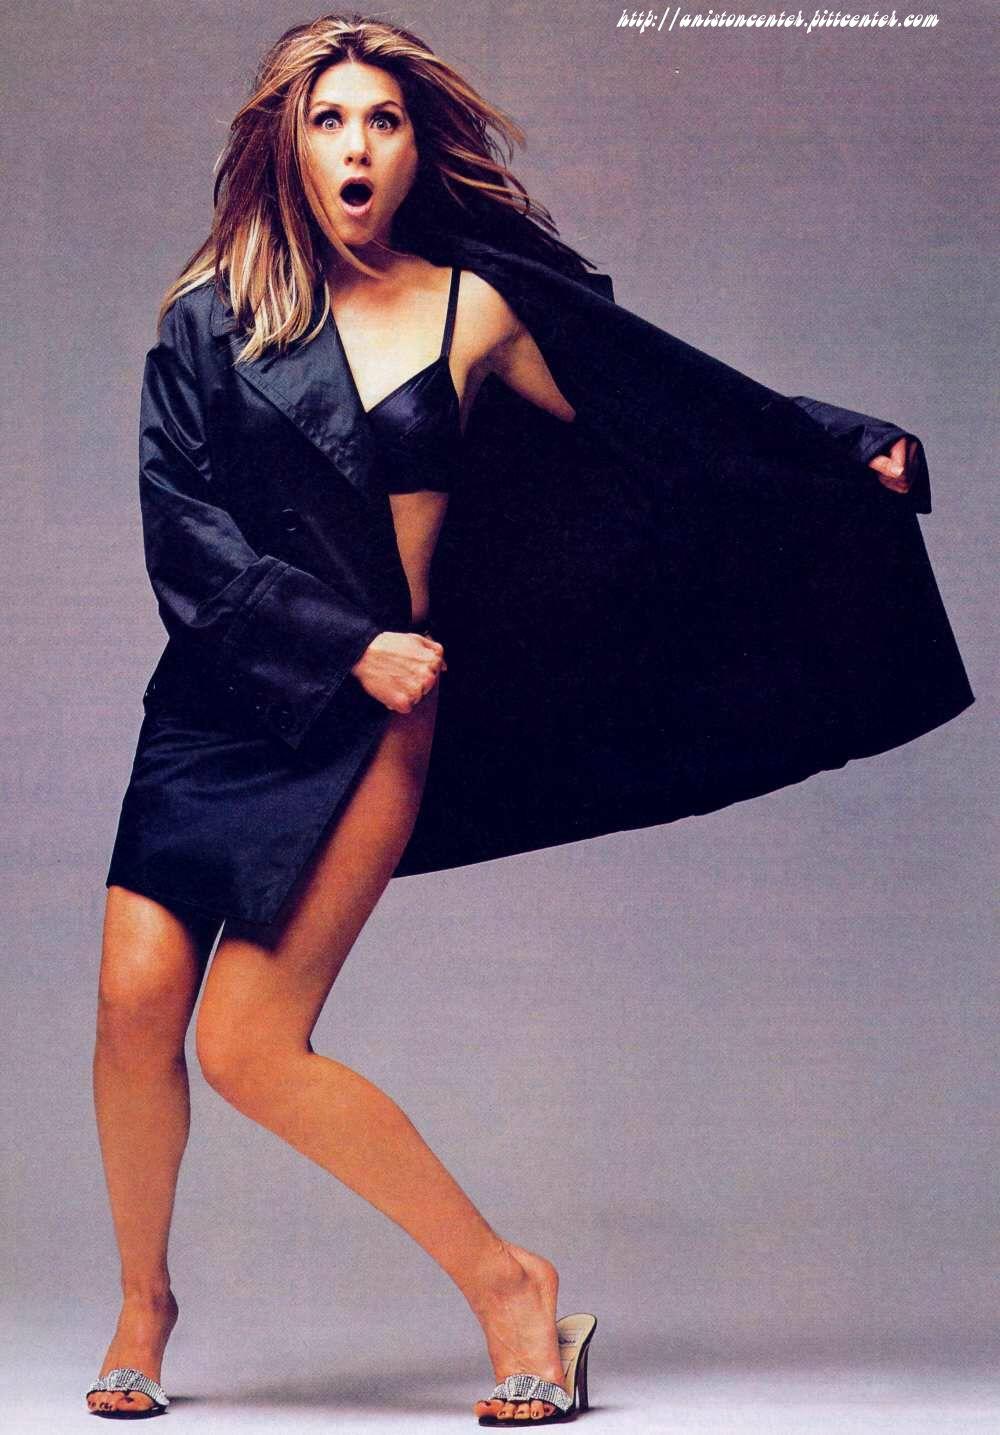 Jennifer Aniston Desnuda En Portada De Gq